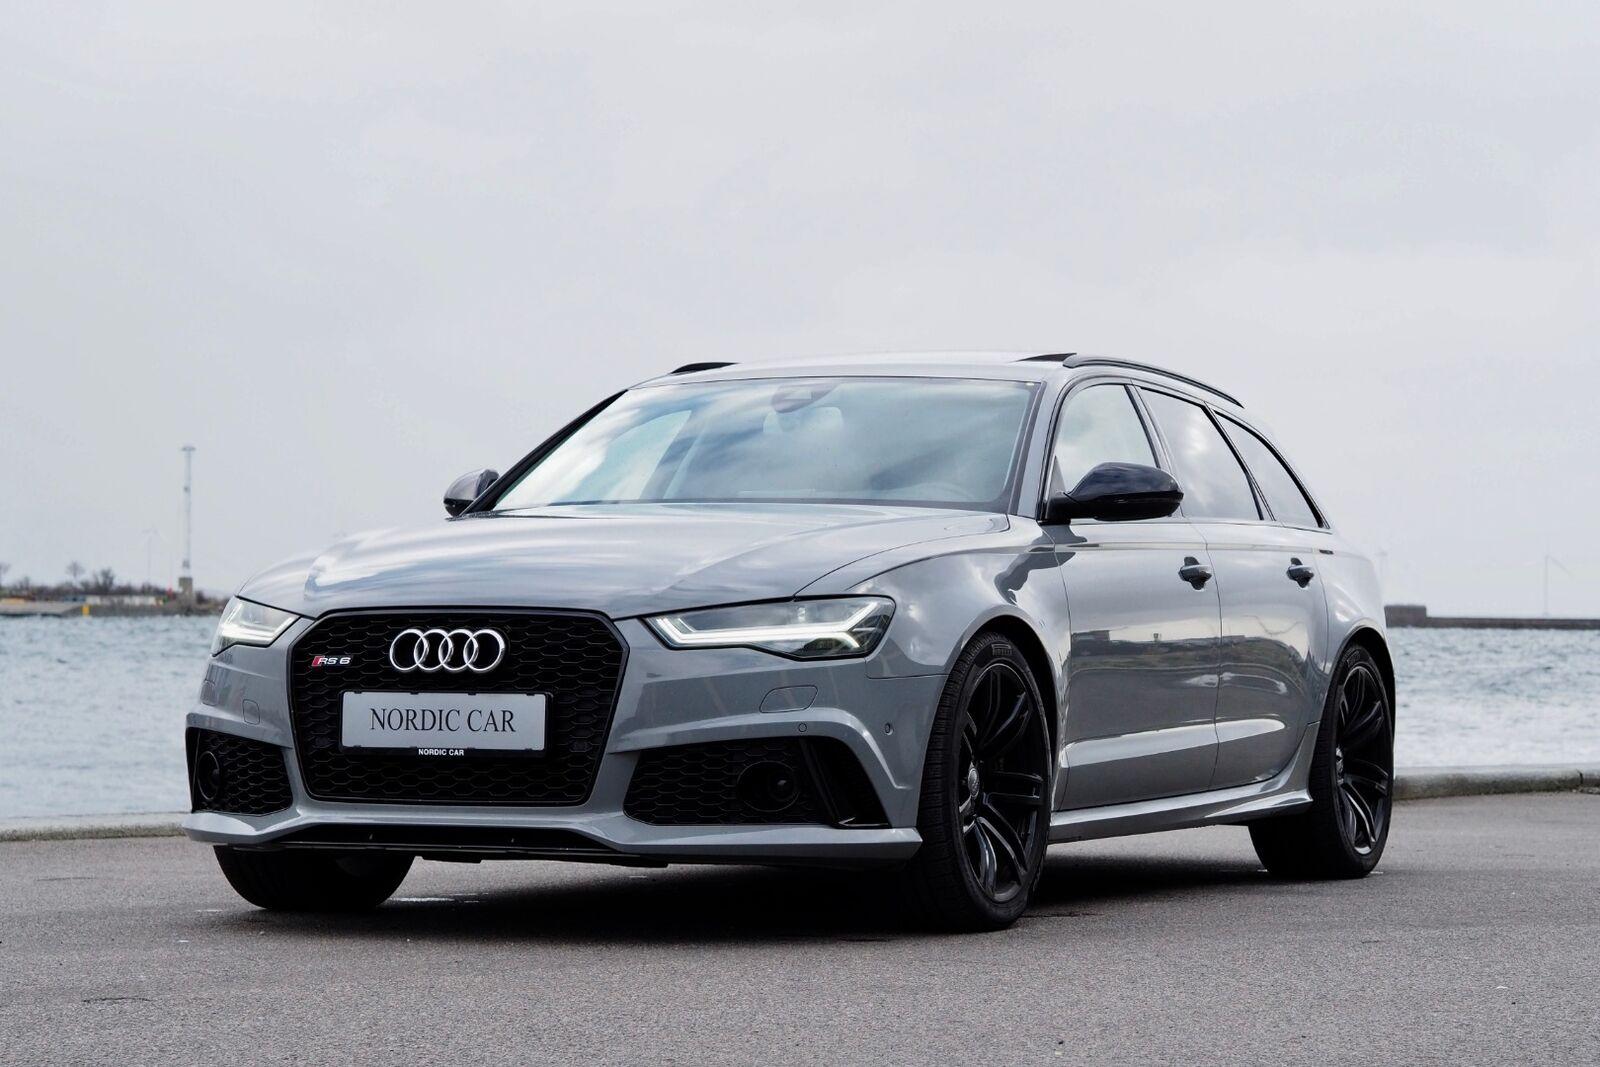 Audi RS6 4,0 TFSi Avant quattro Tiptr. 5d - 8.000 kr.